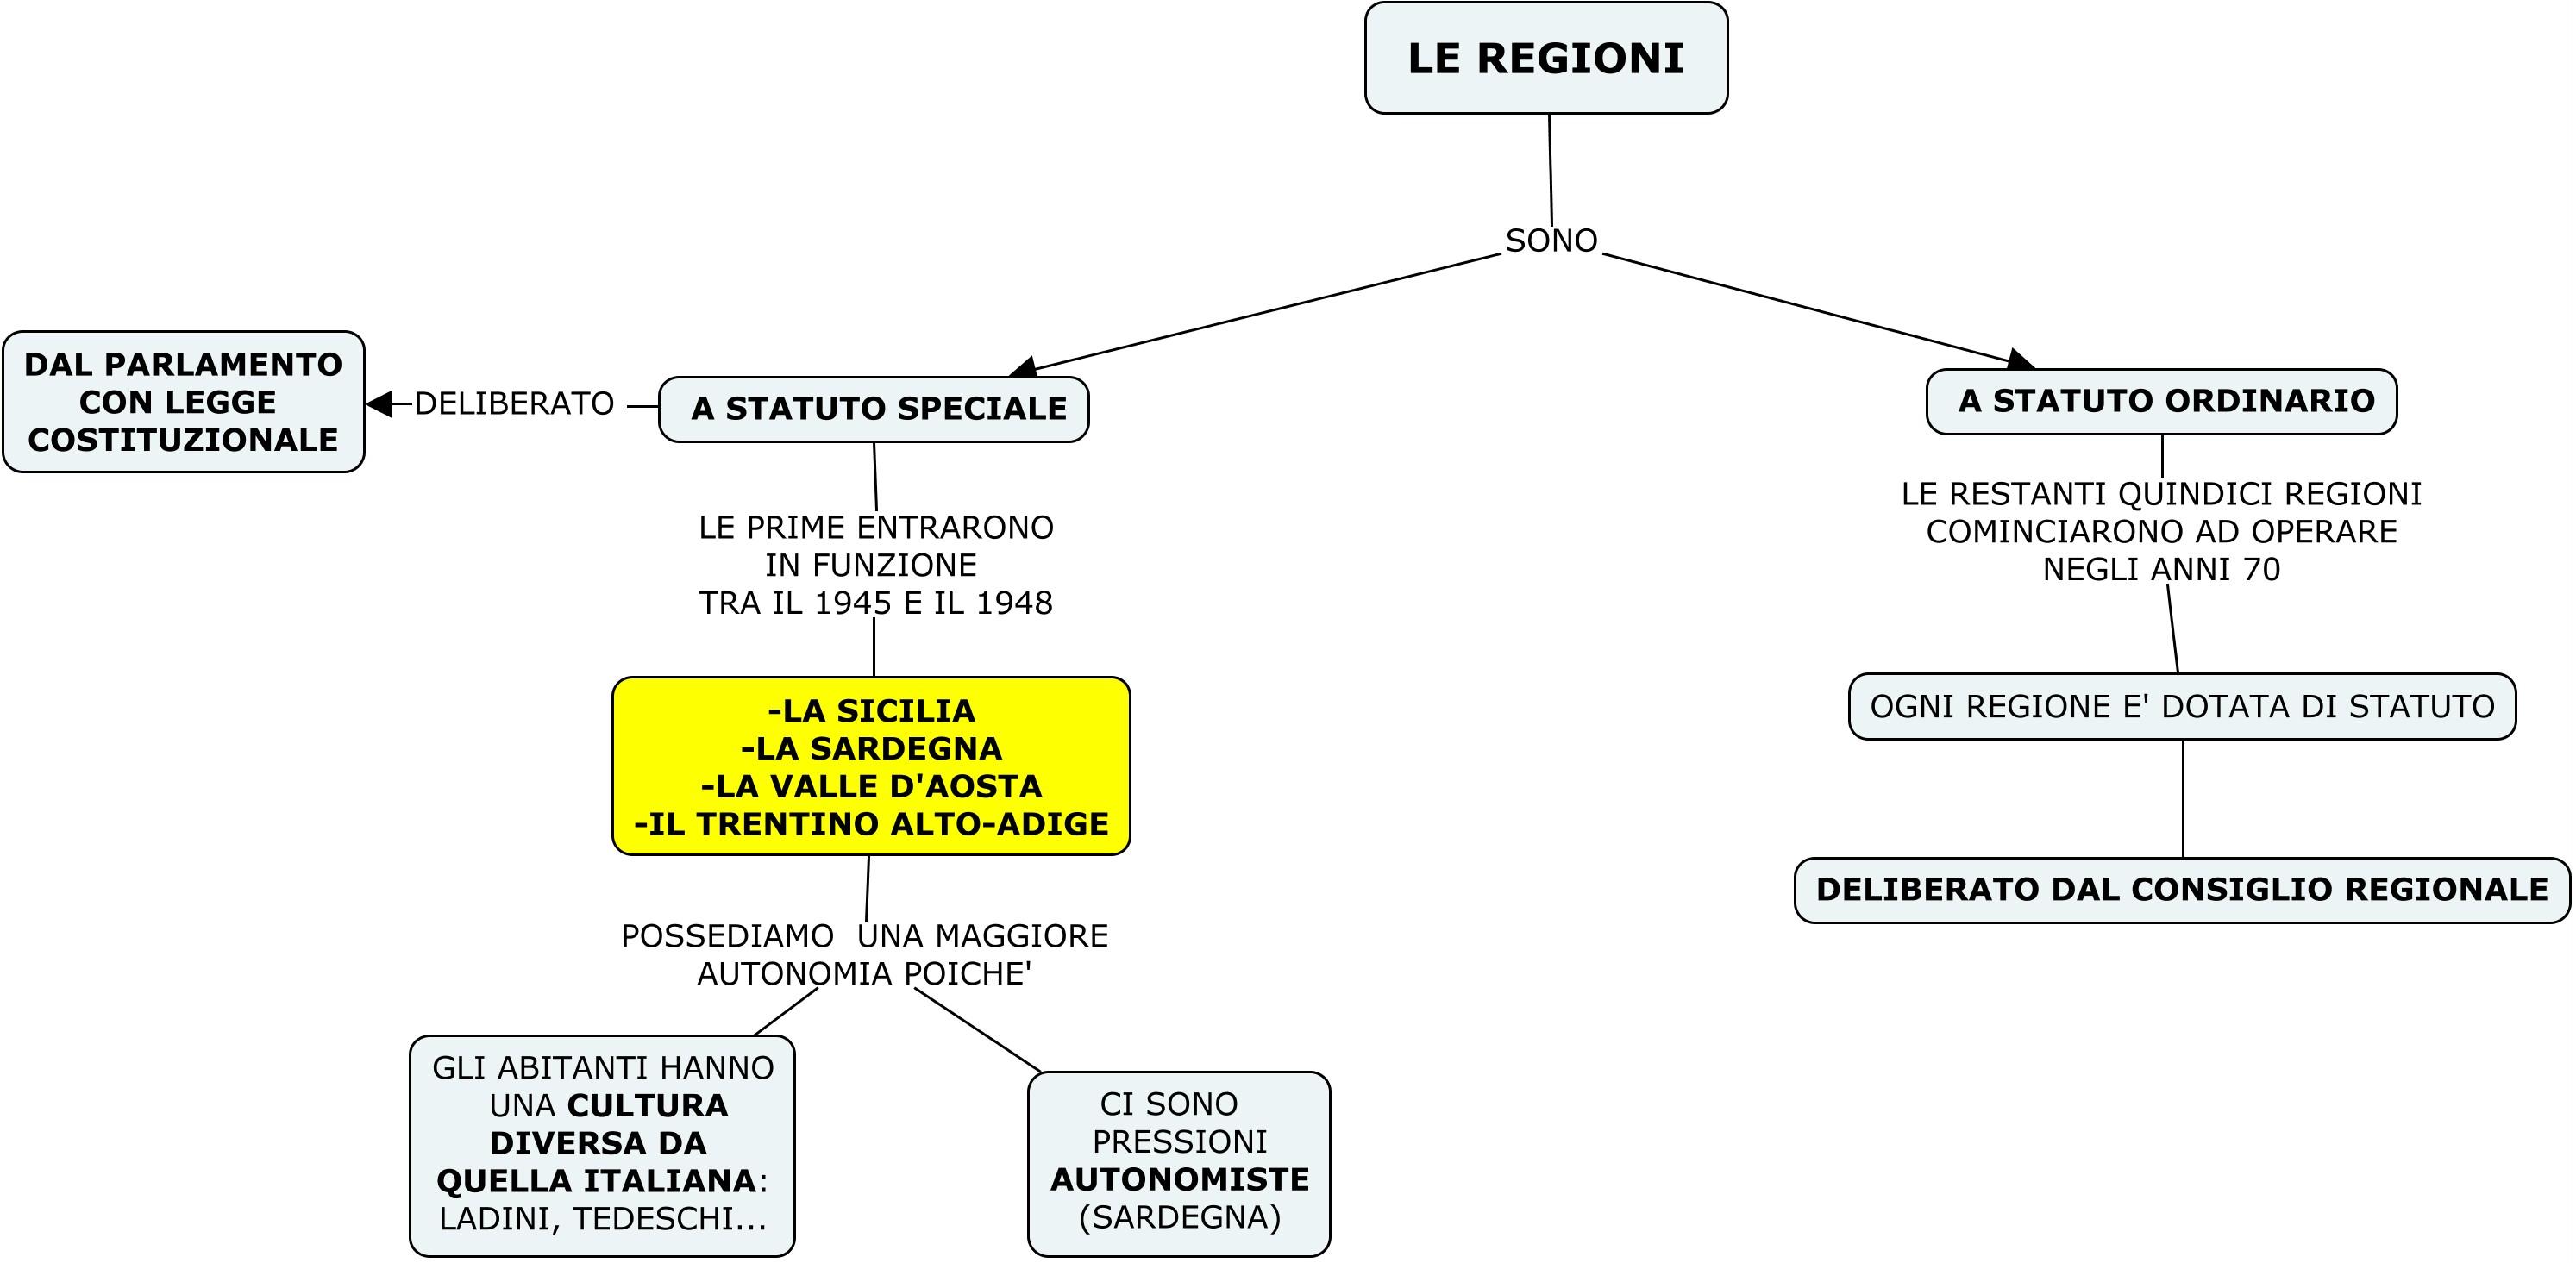 MAPPA 7